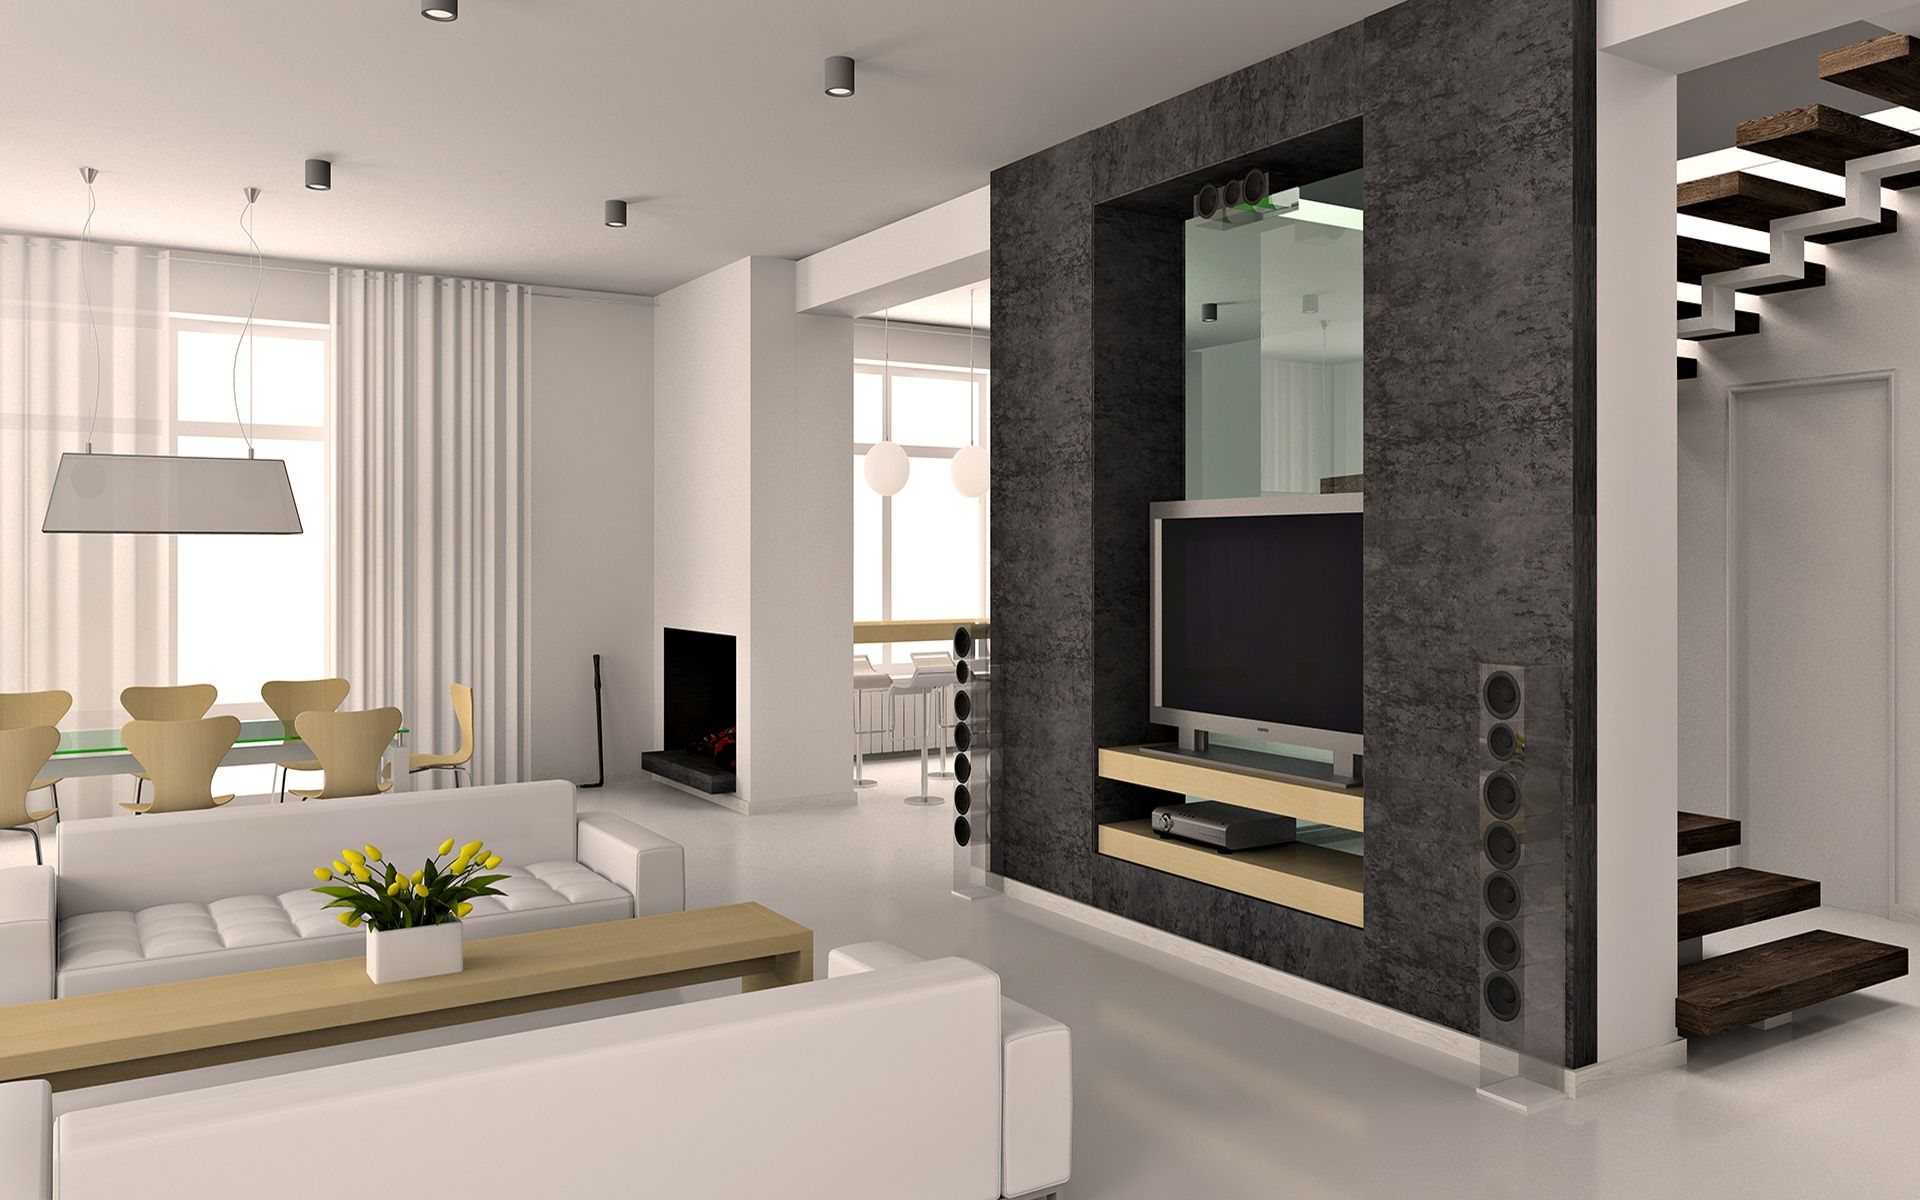 http://www.thewowdecor.com/wp-content/uploads/2015/07/Interior-Design-21.jpg